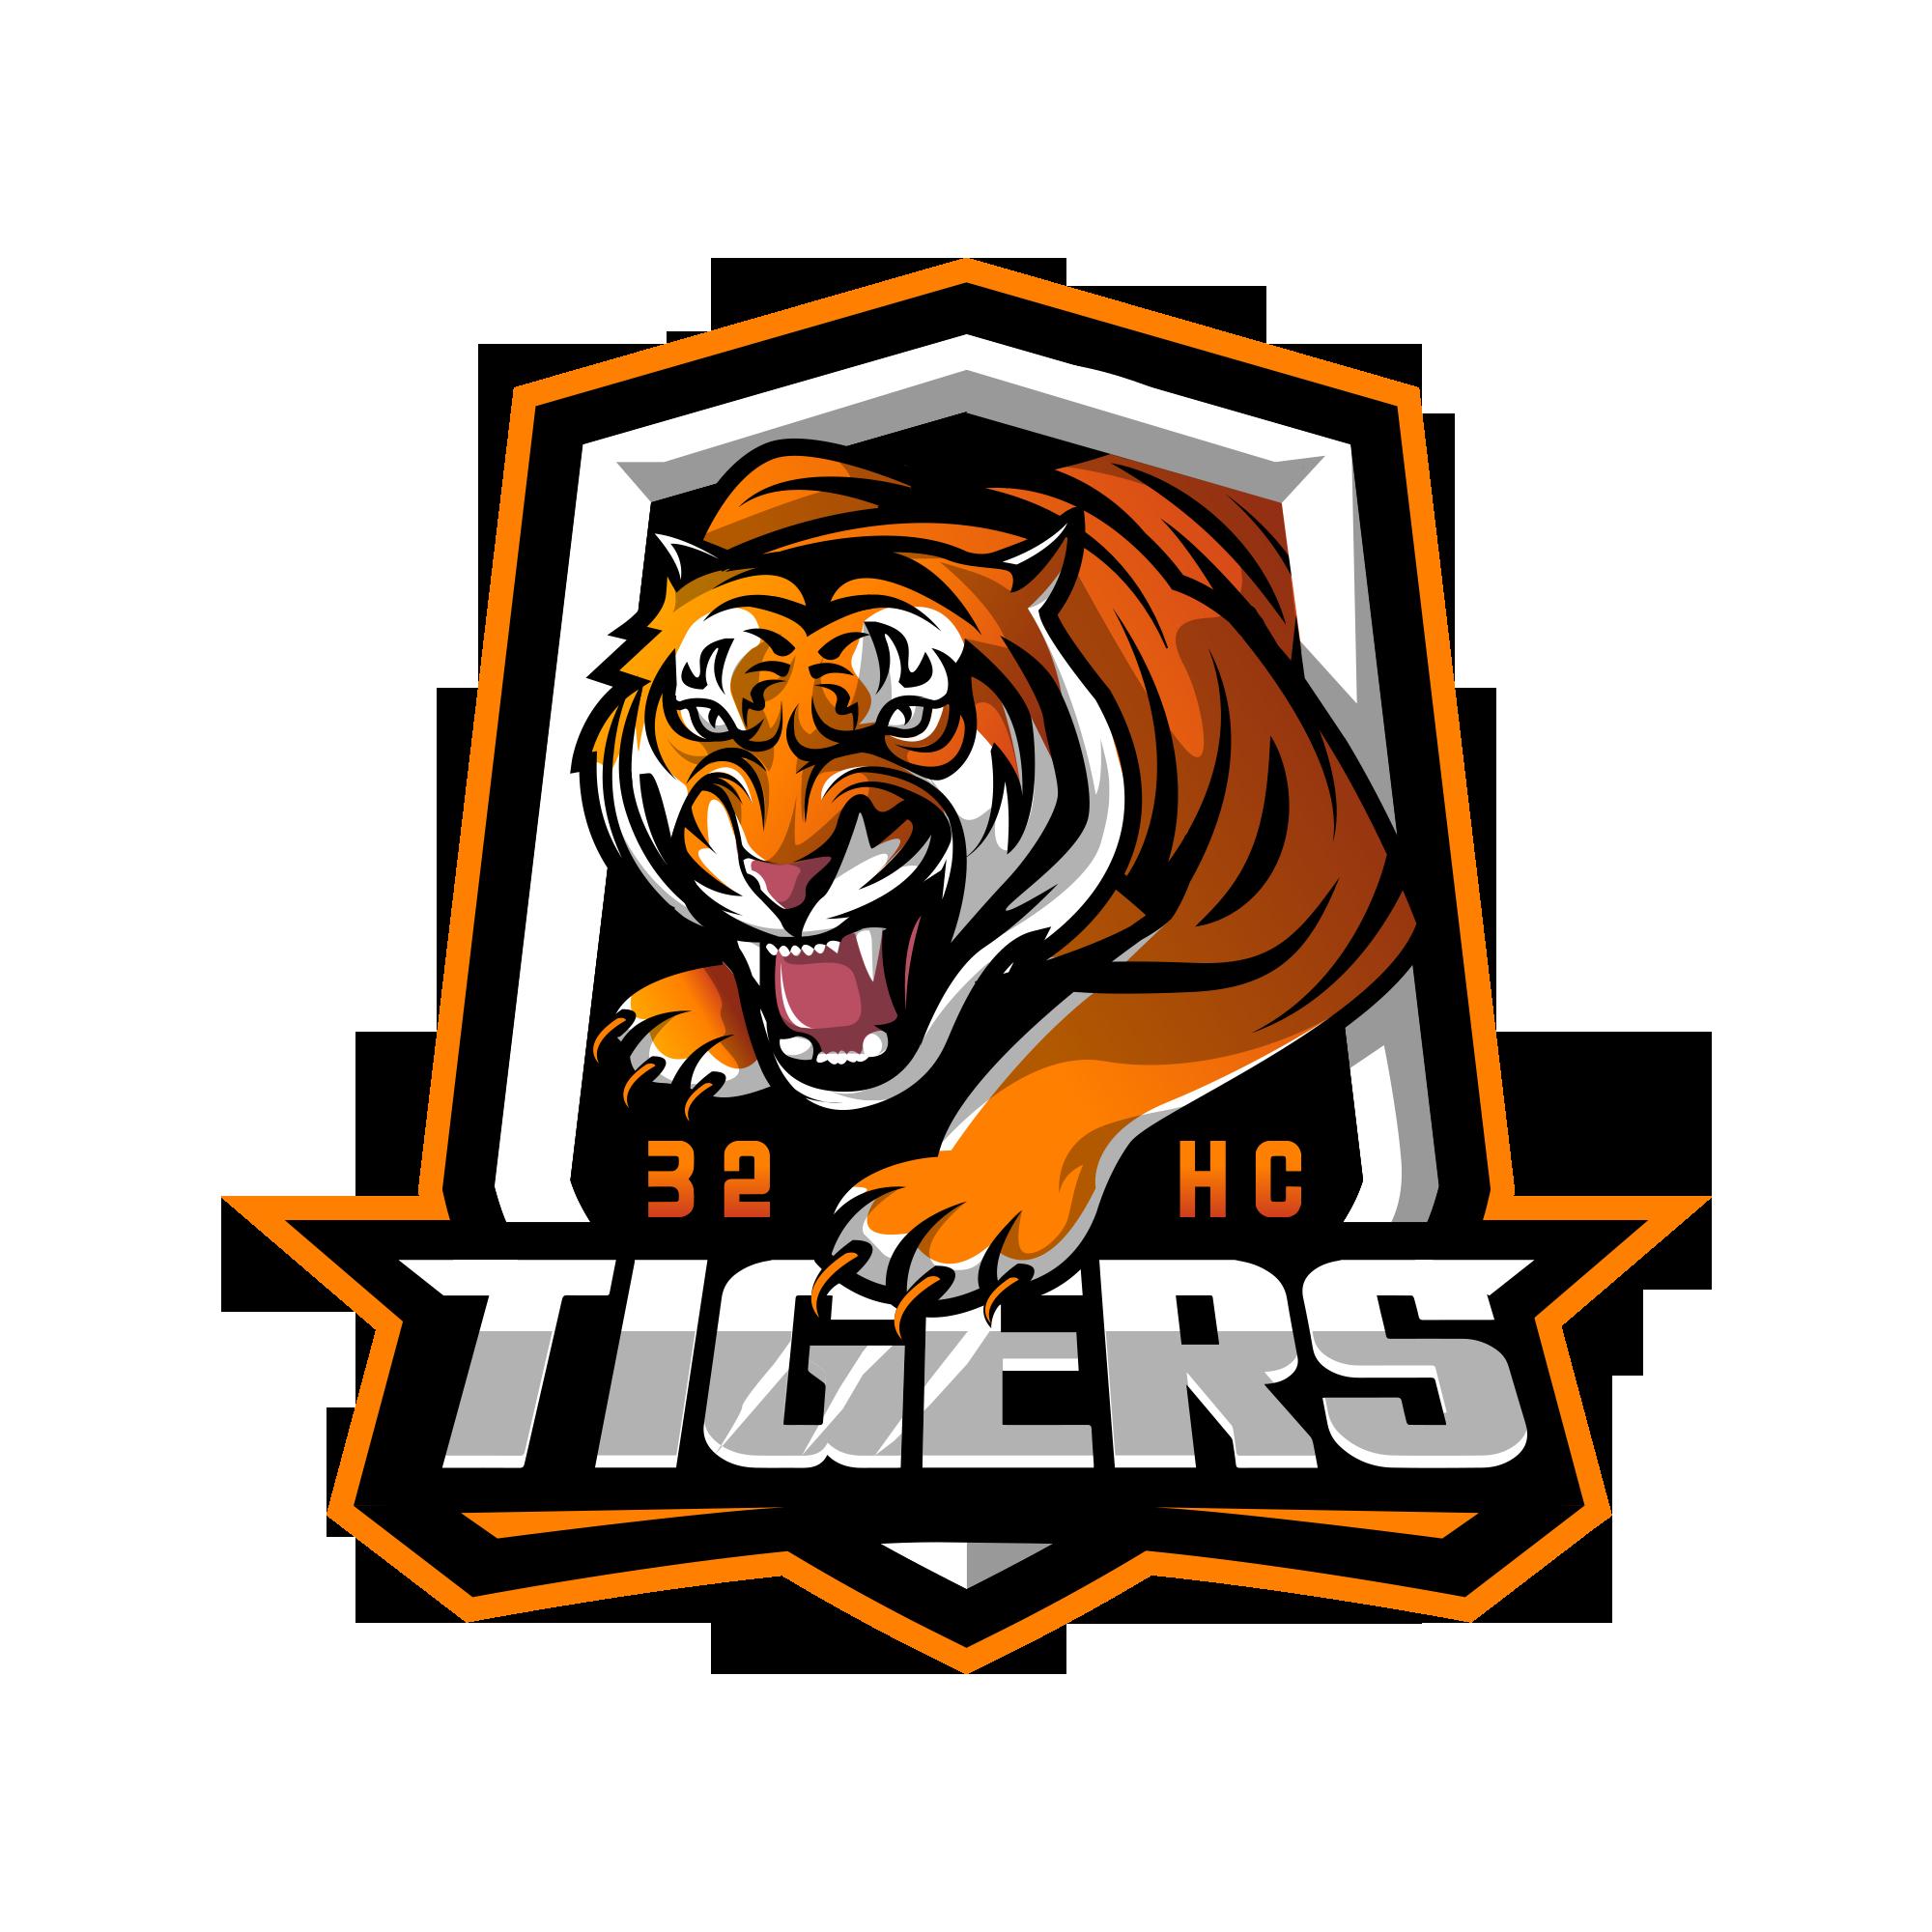 Army unit logo of an aggressive tiger